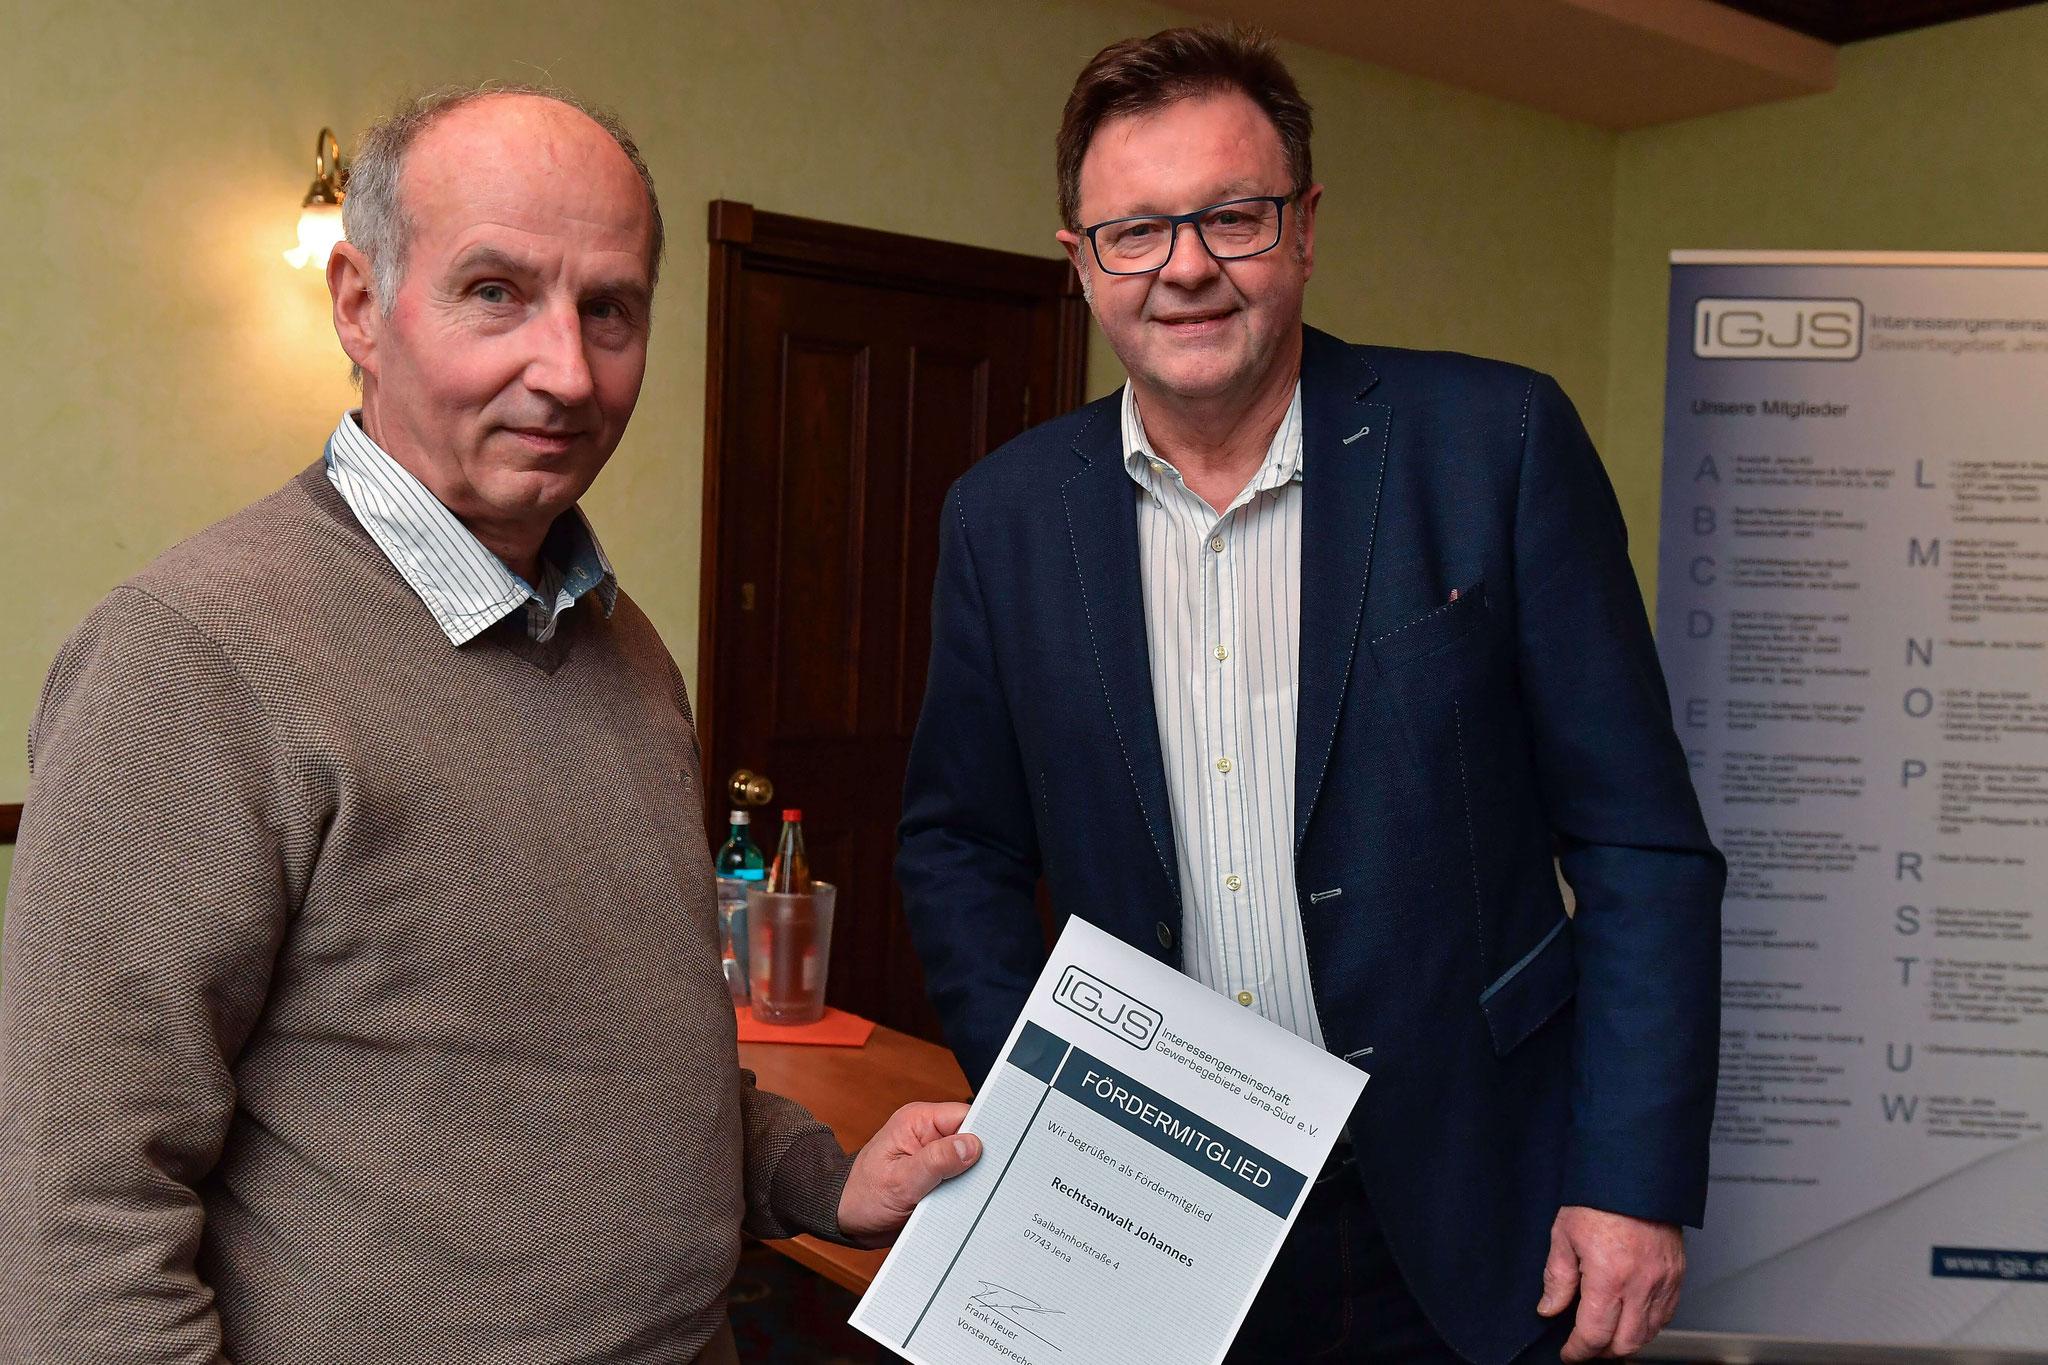 Frank Heuer begrüßt offiziell RA Johannes als neues Fördermitglied